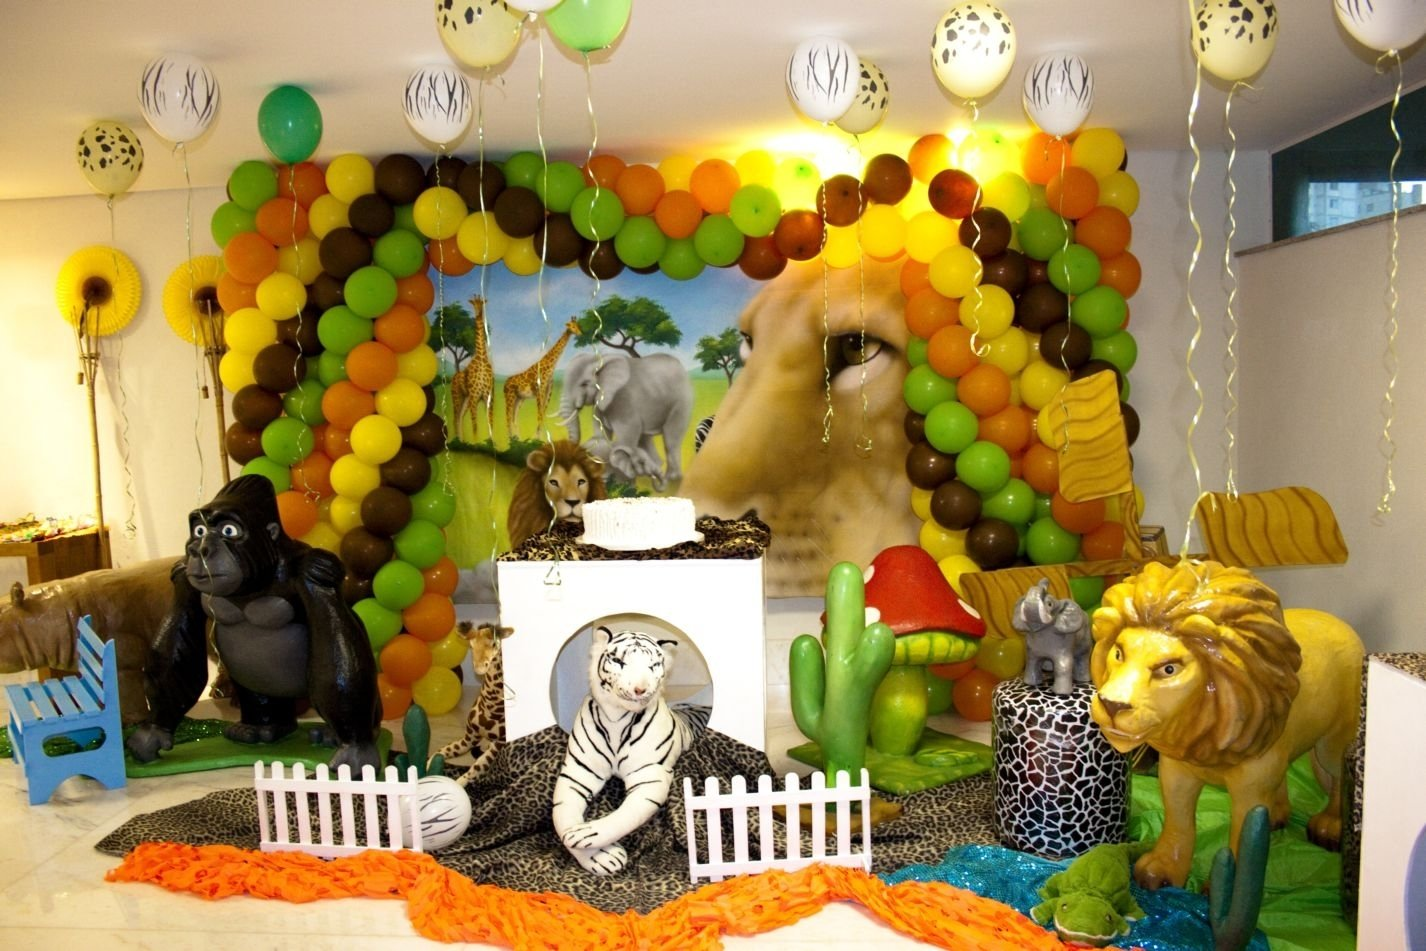 10 Stylish Safari Theme Baby Shower Ideas safari baby shower decorations that look cute and beautiful home 1 2020